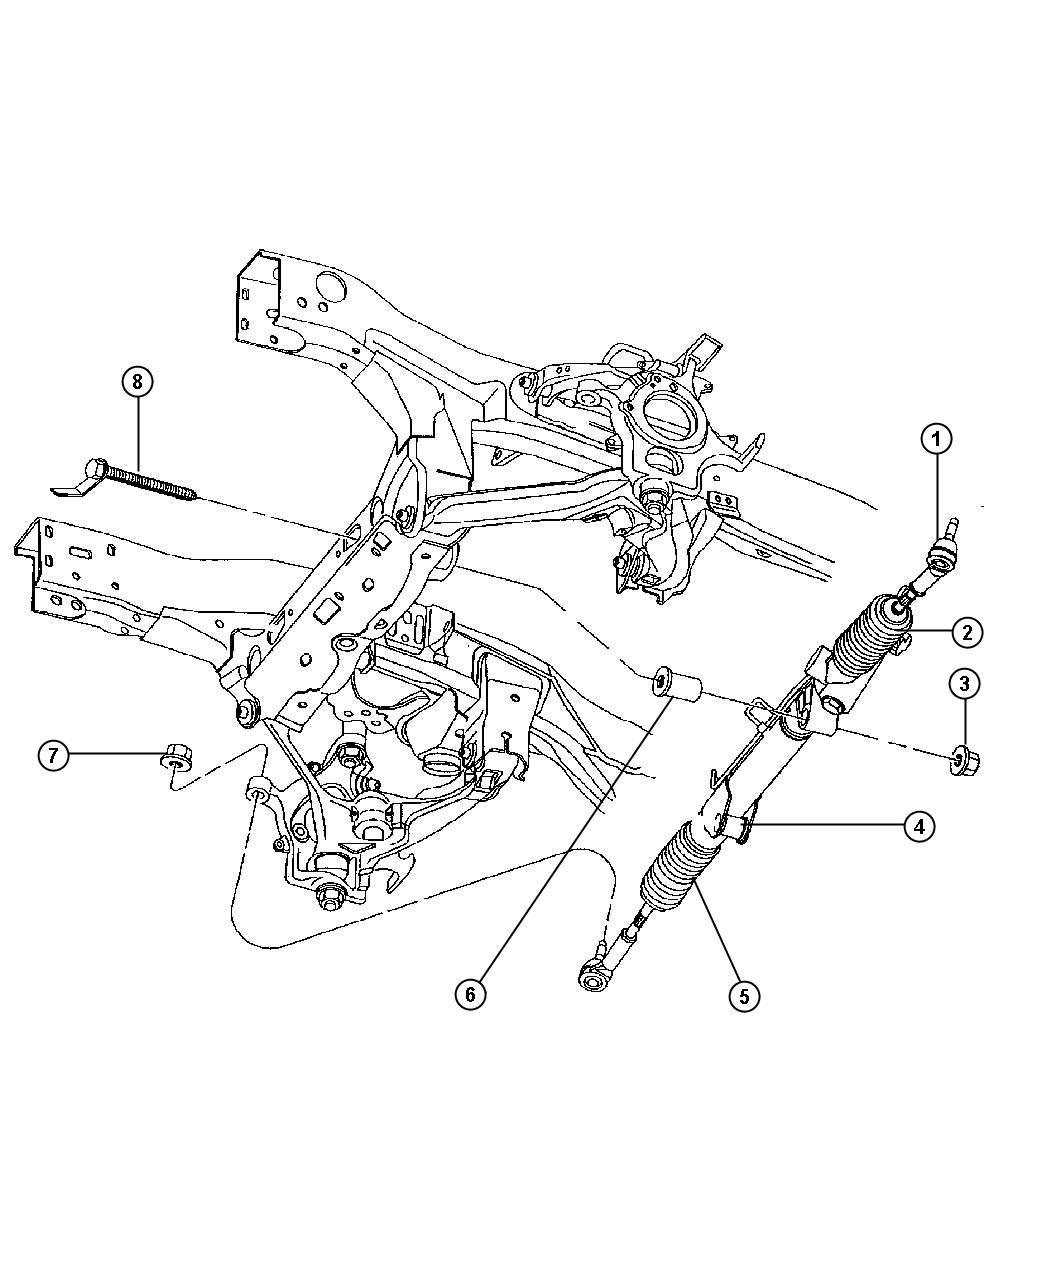 Dodge Dakota Gear, Rack & Pinion Power Steering, N5.